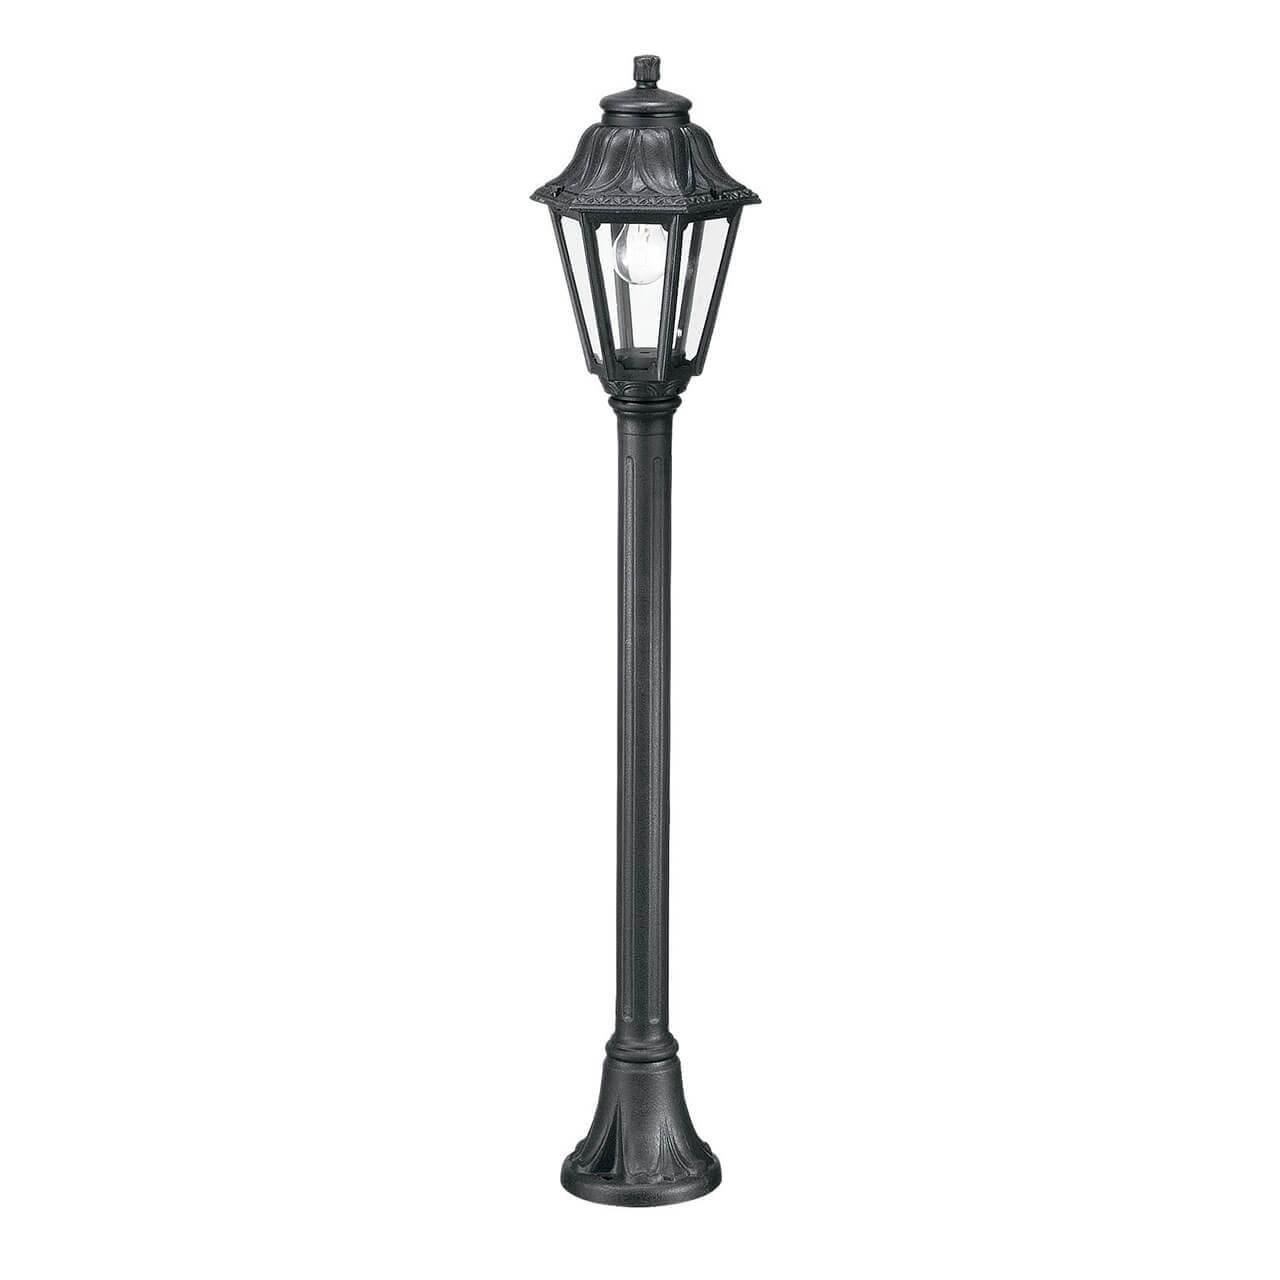 Уличный светильник Ideal Lux Anna PT1 Nero